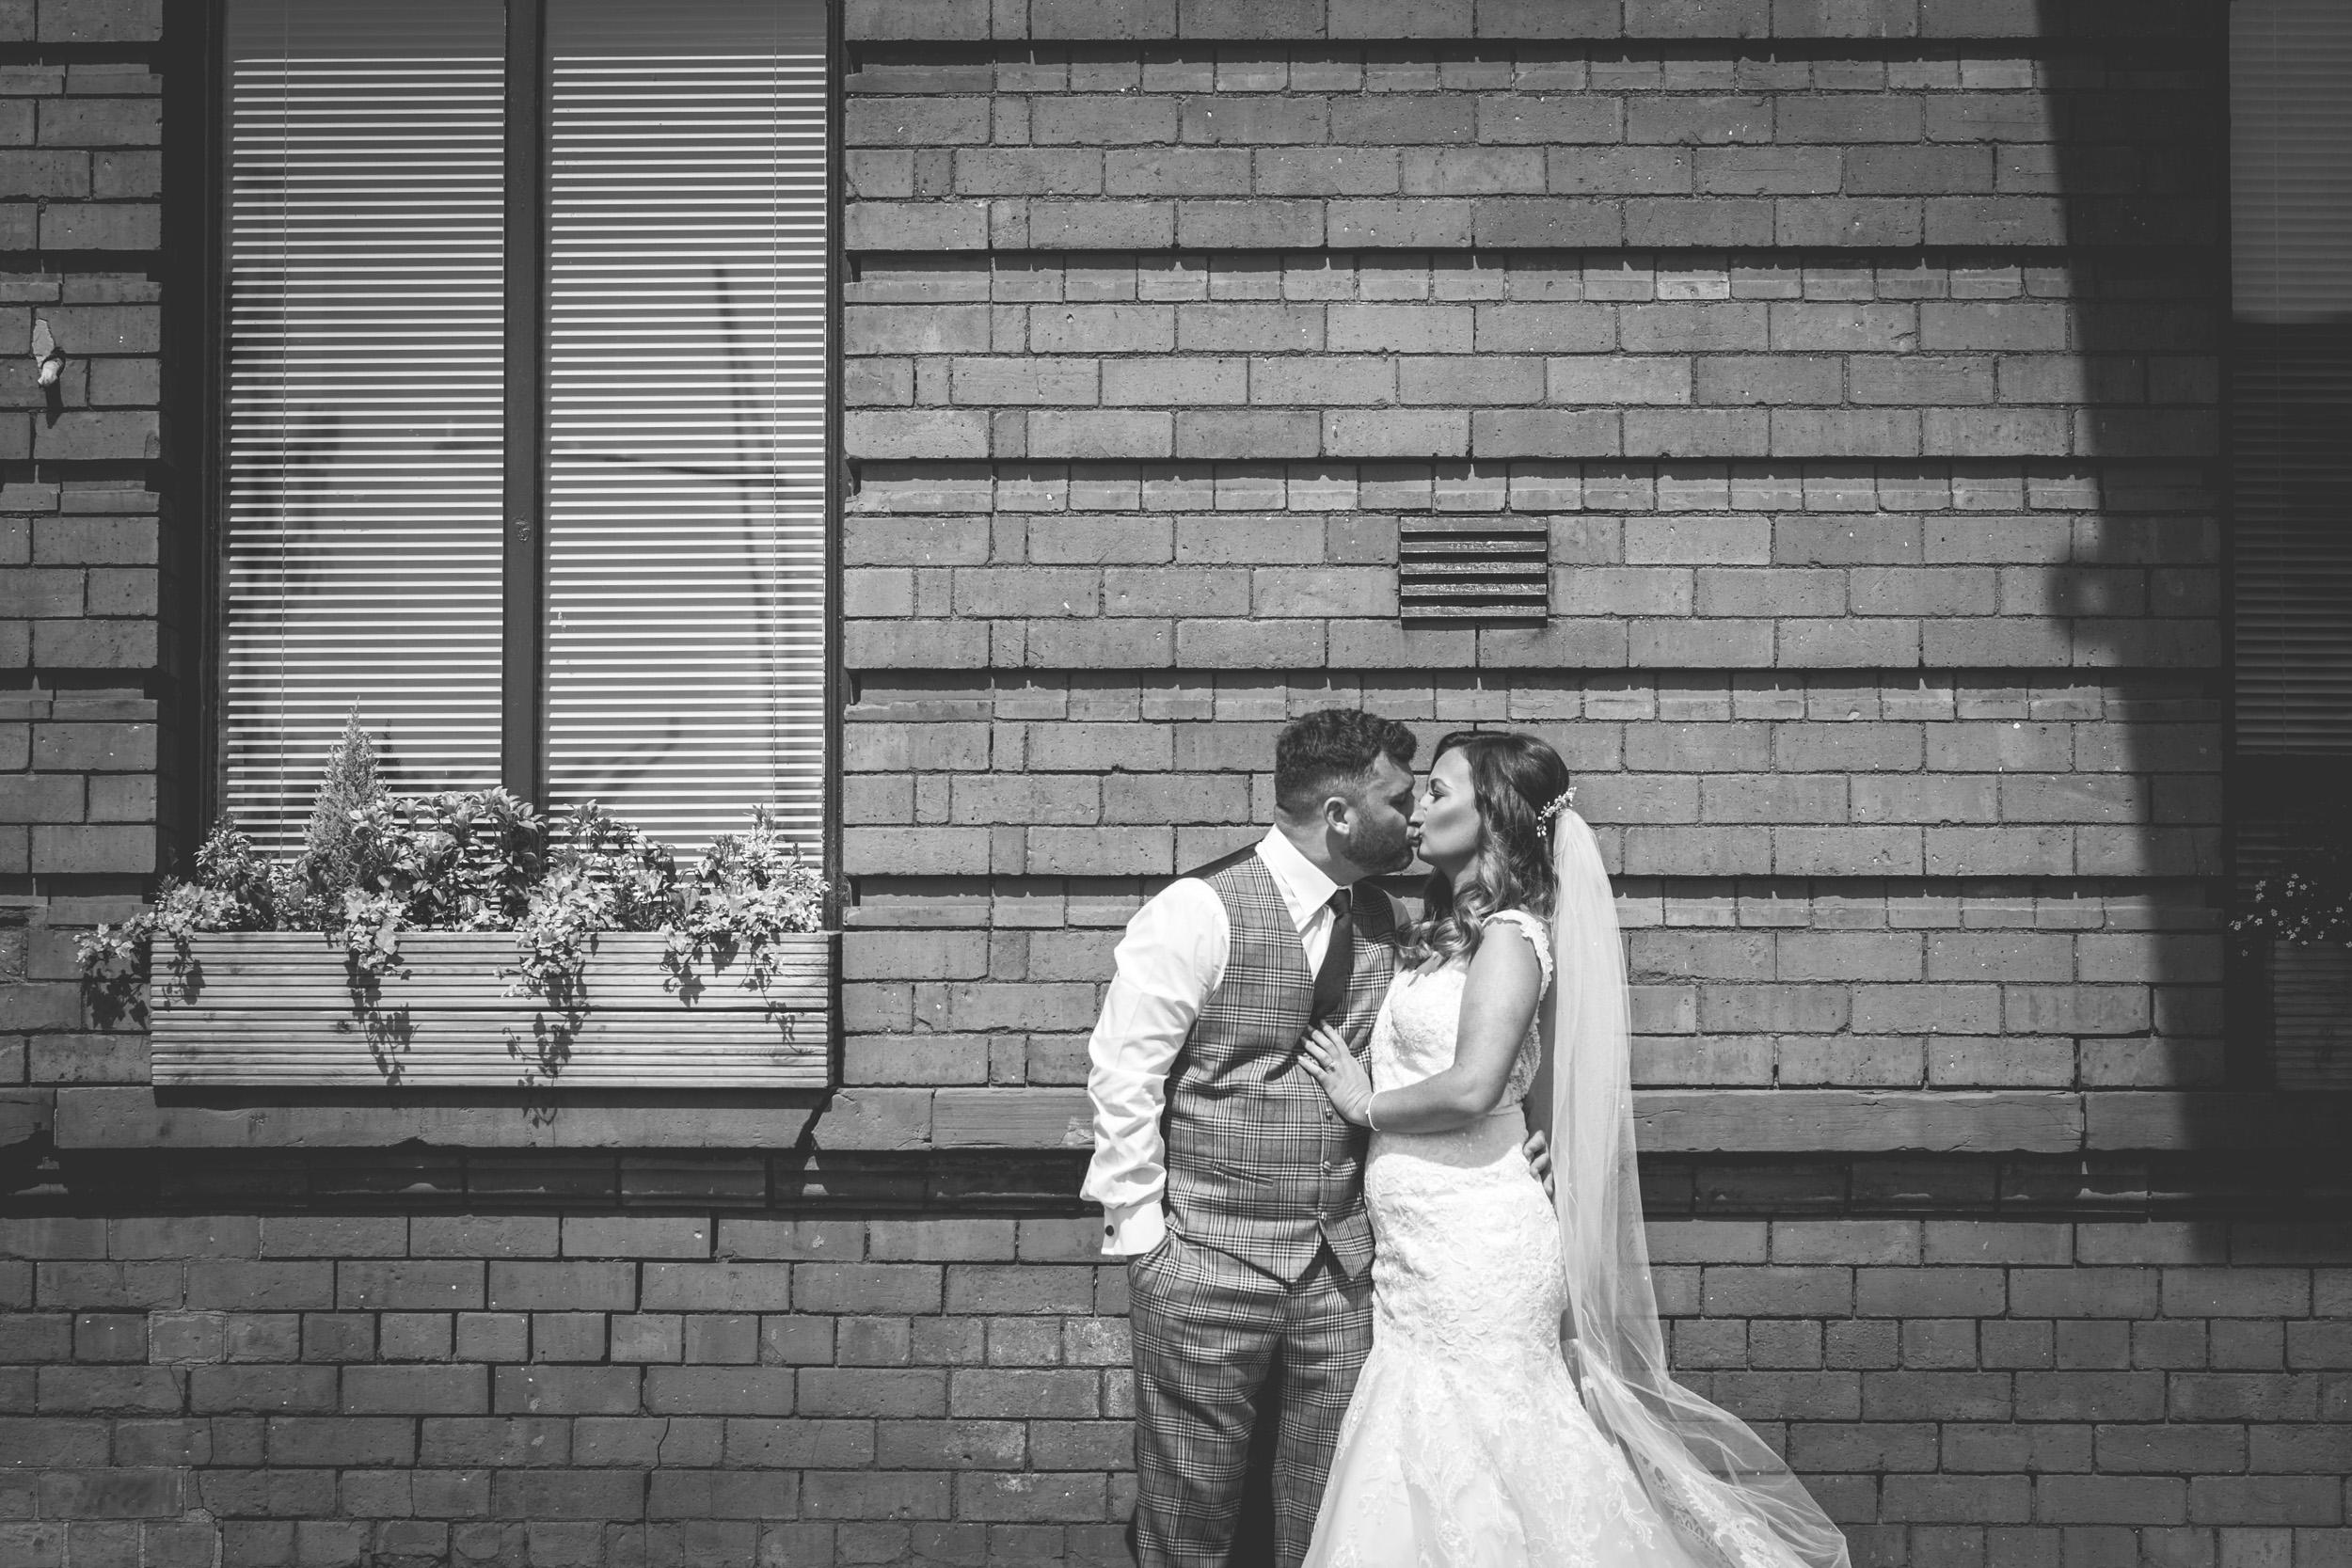 Brian McEwan   Northern Ireland Wedding Photographer   Rebecca & Michael   Portraits-83.jpg